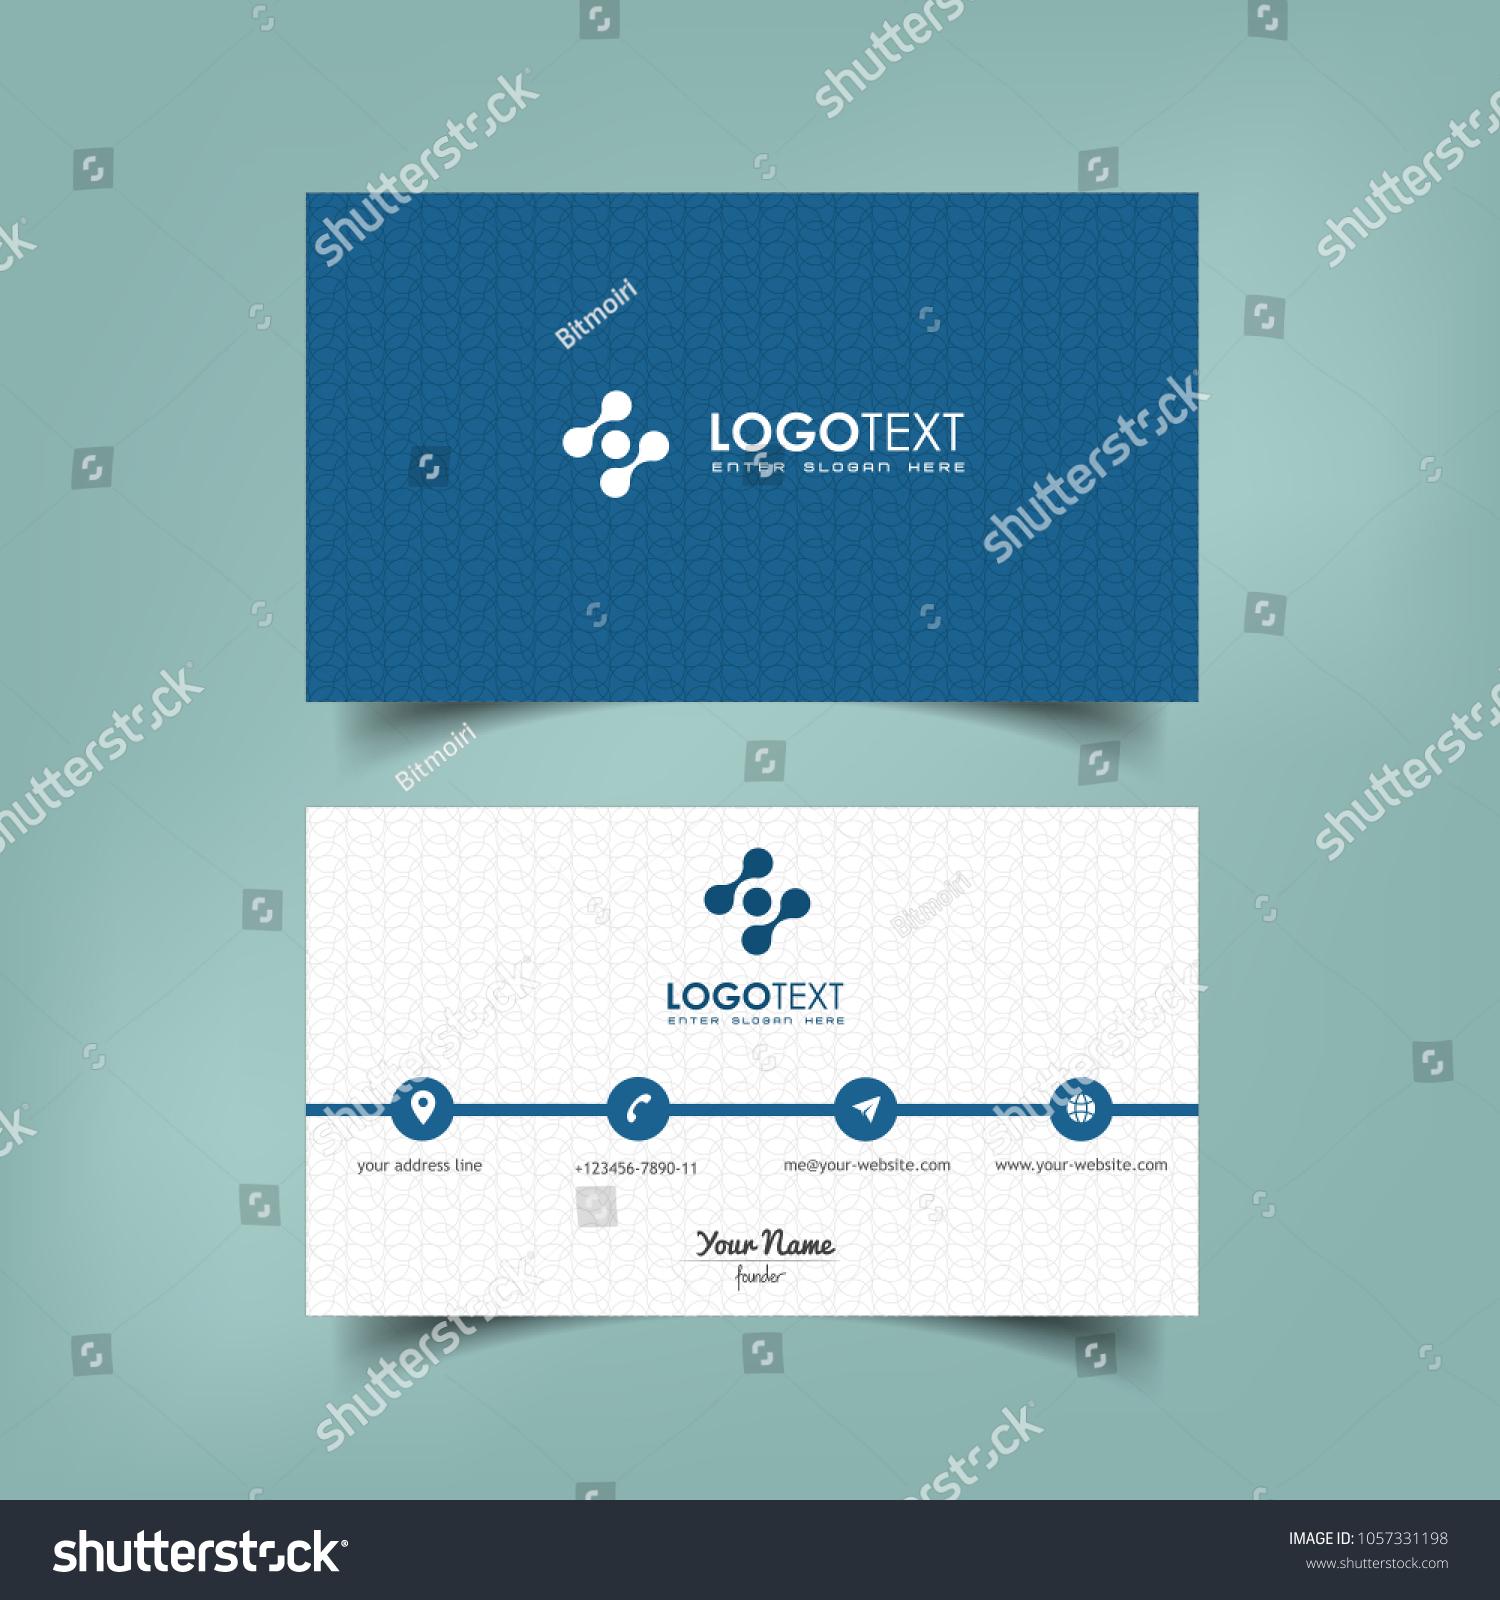 Simple Elegant Business Card Vector Templates Stock Photo (Photo ...